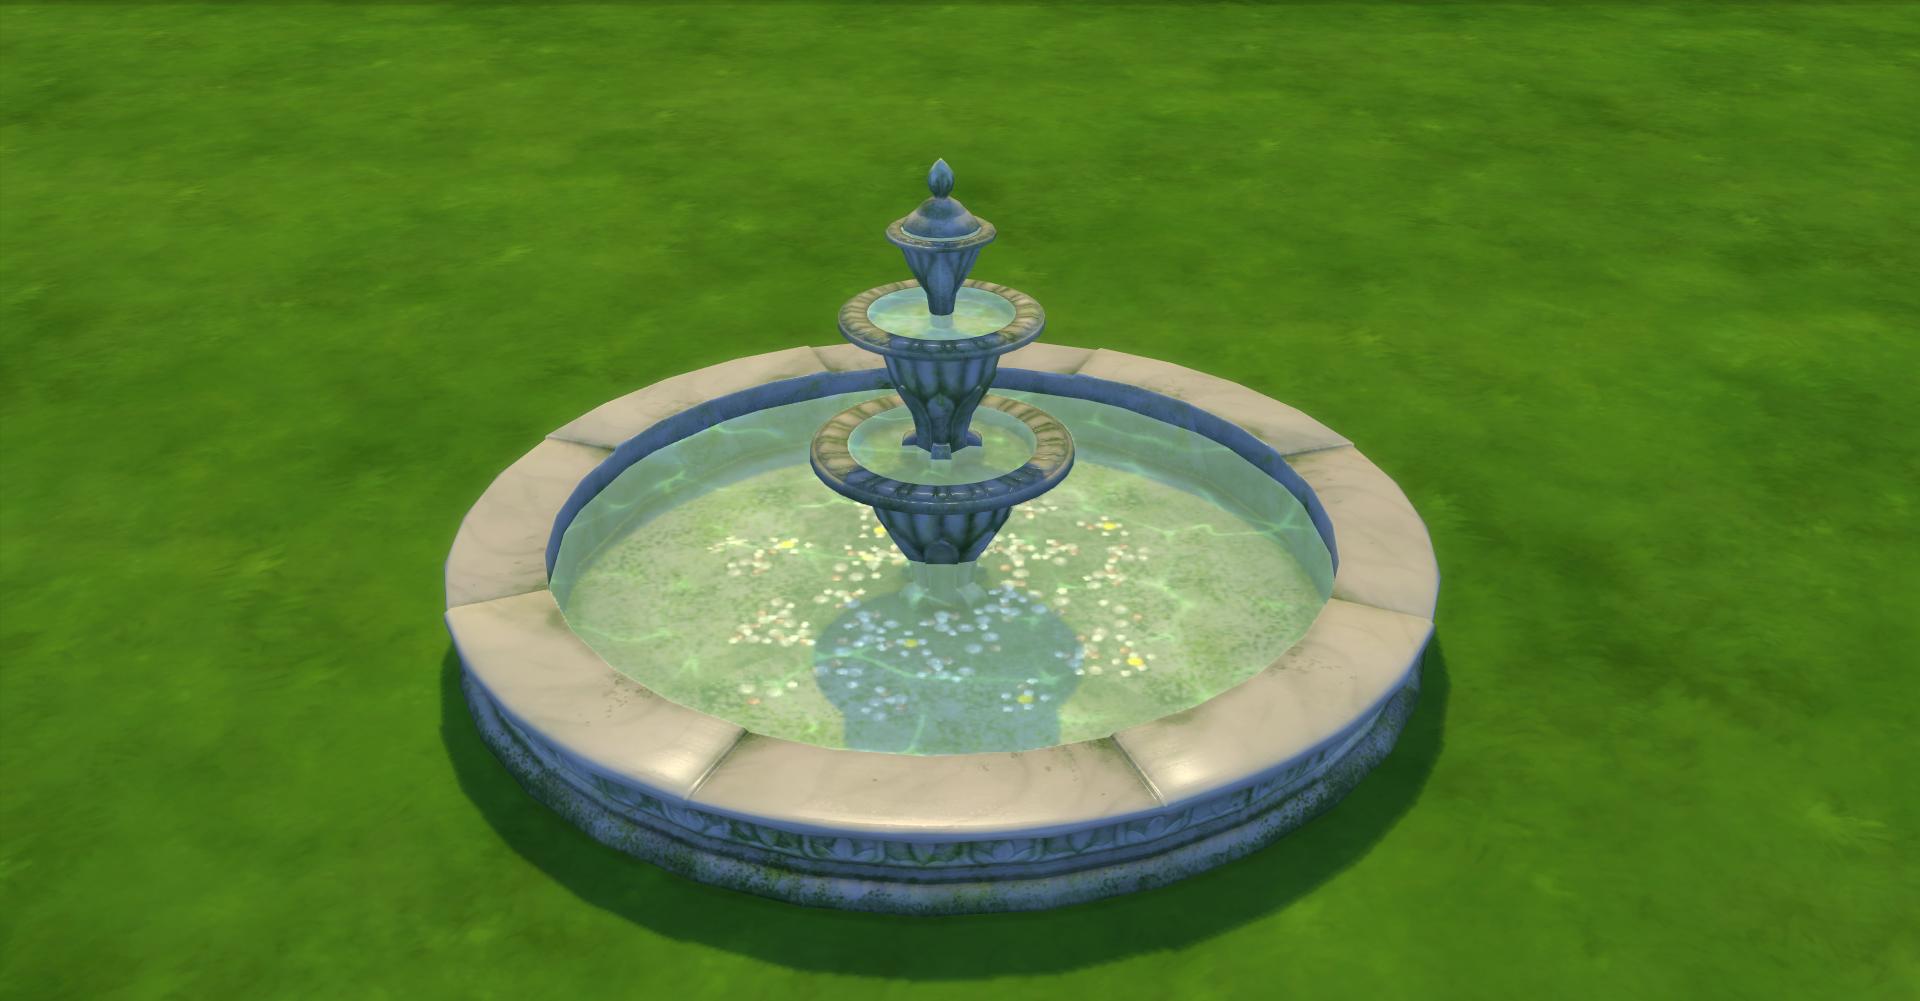 Fountain Of Gluteus Maximus The Sims Wiki Fandom